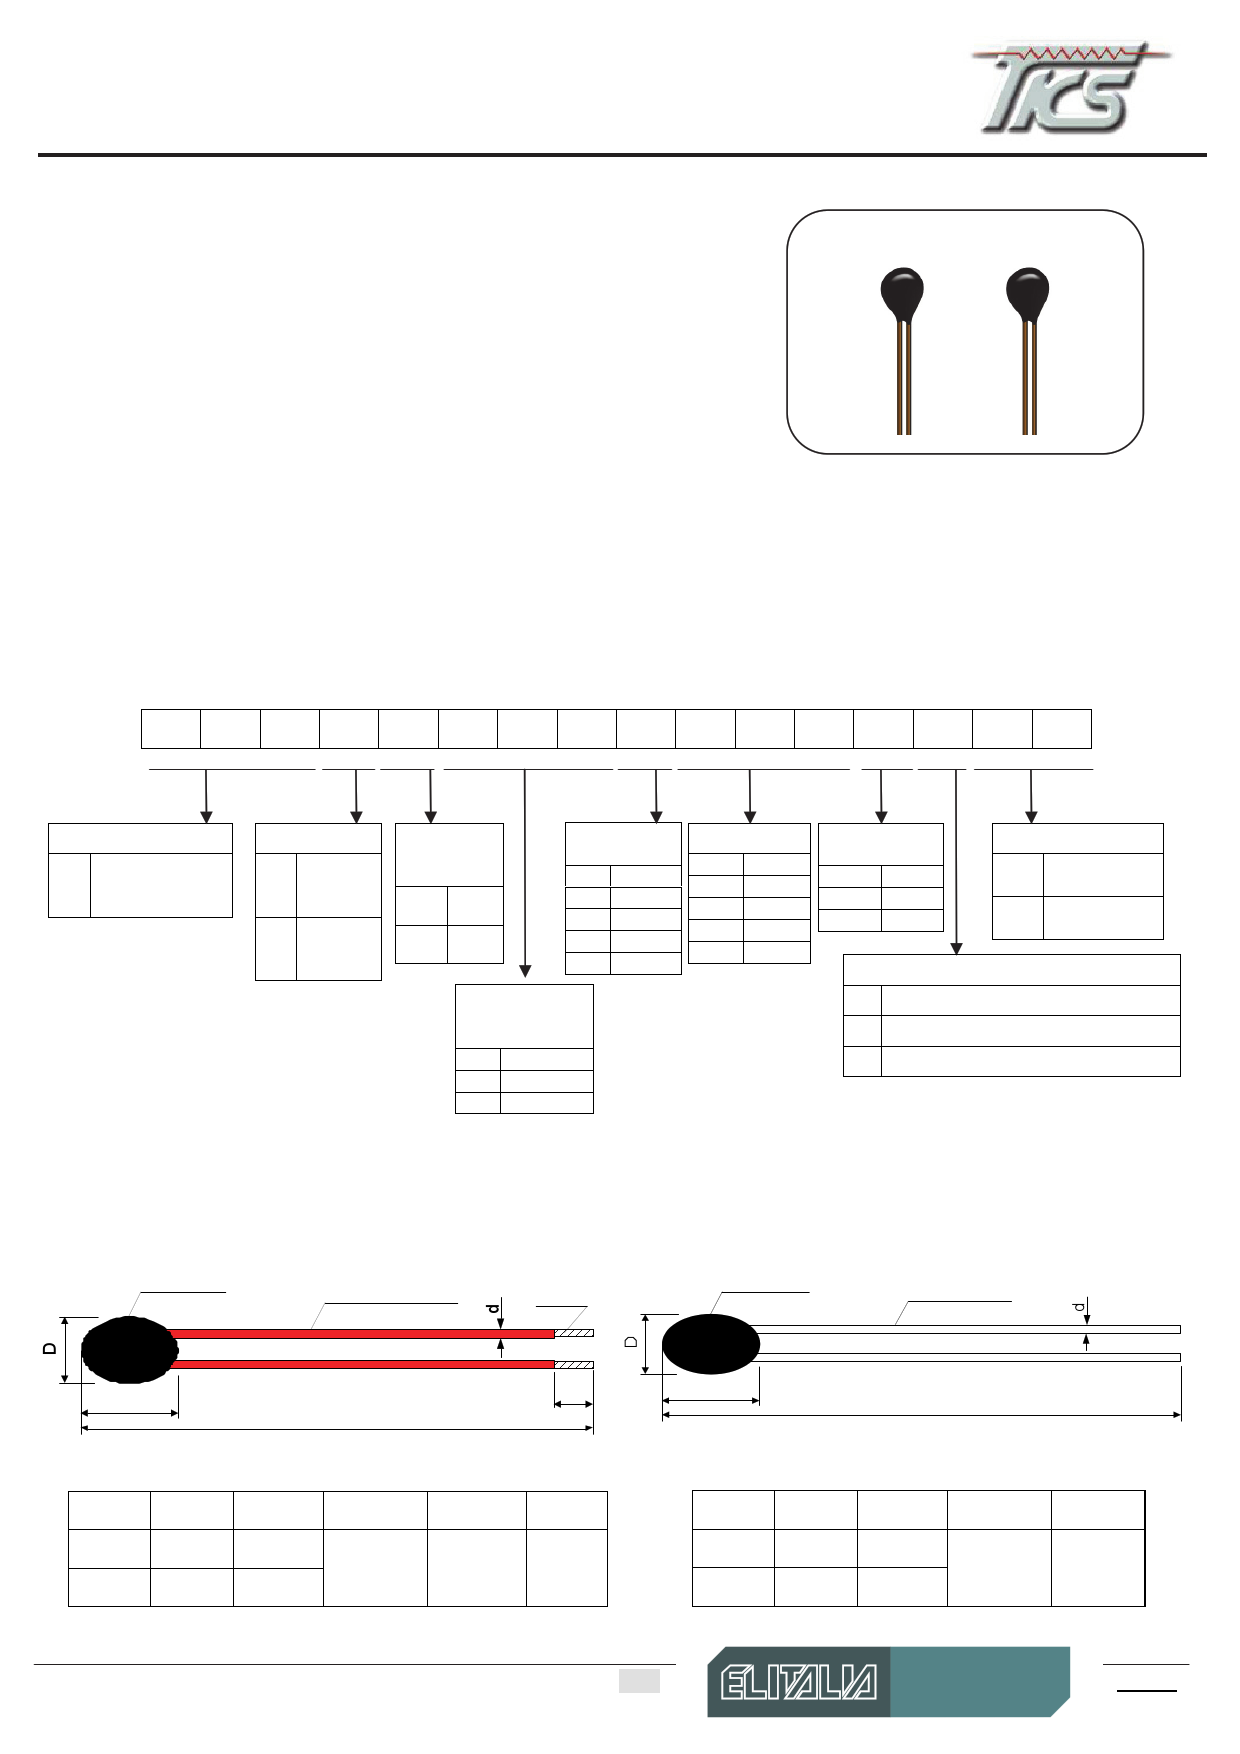 TTS2A502 datasheet, circuit